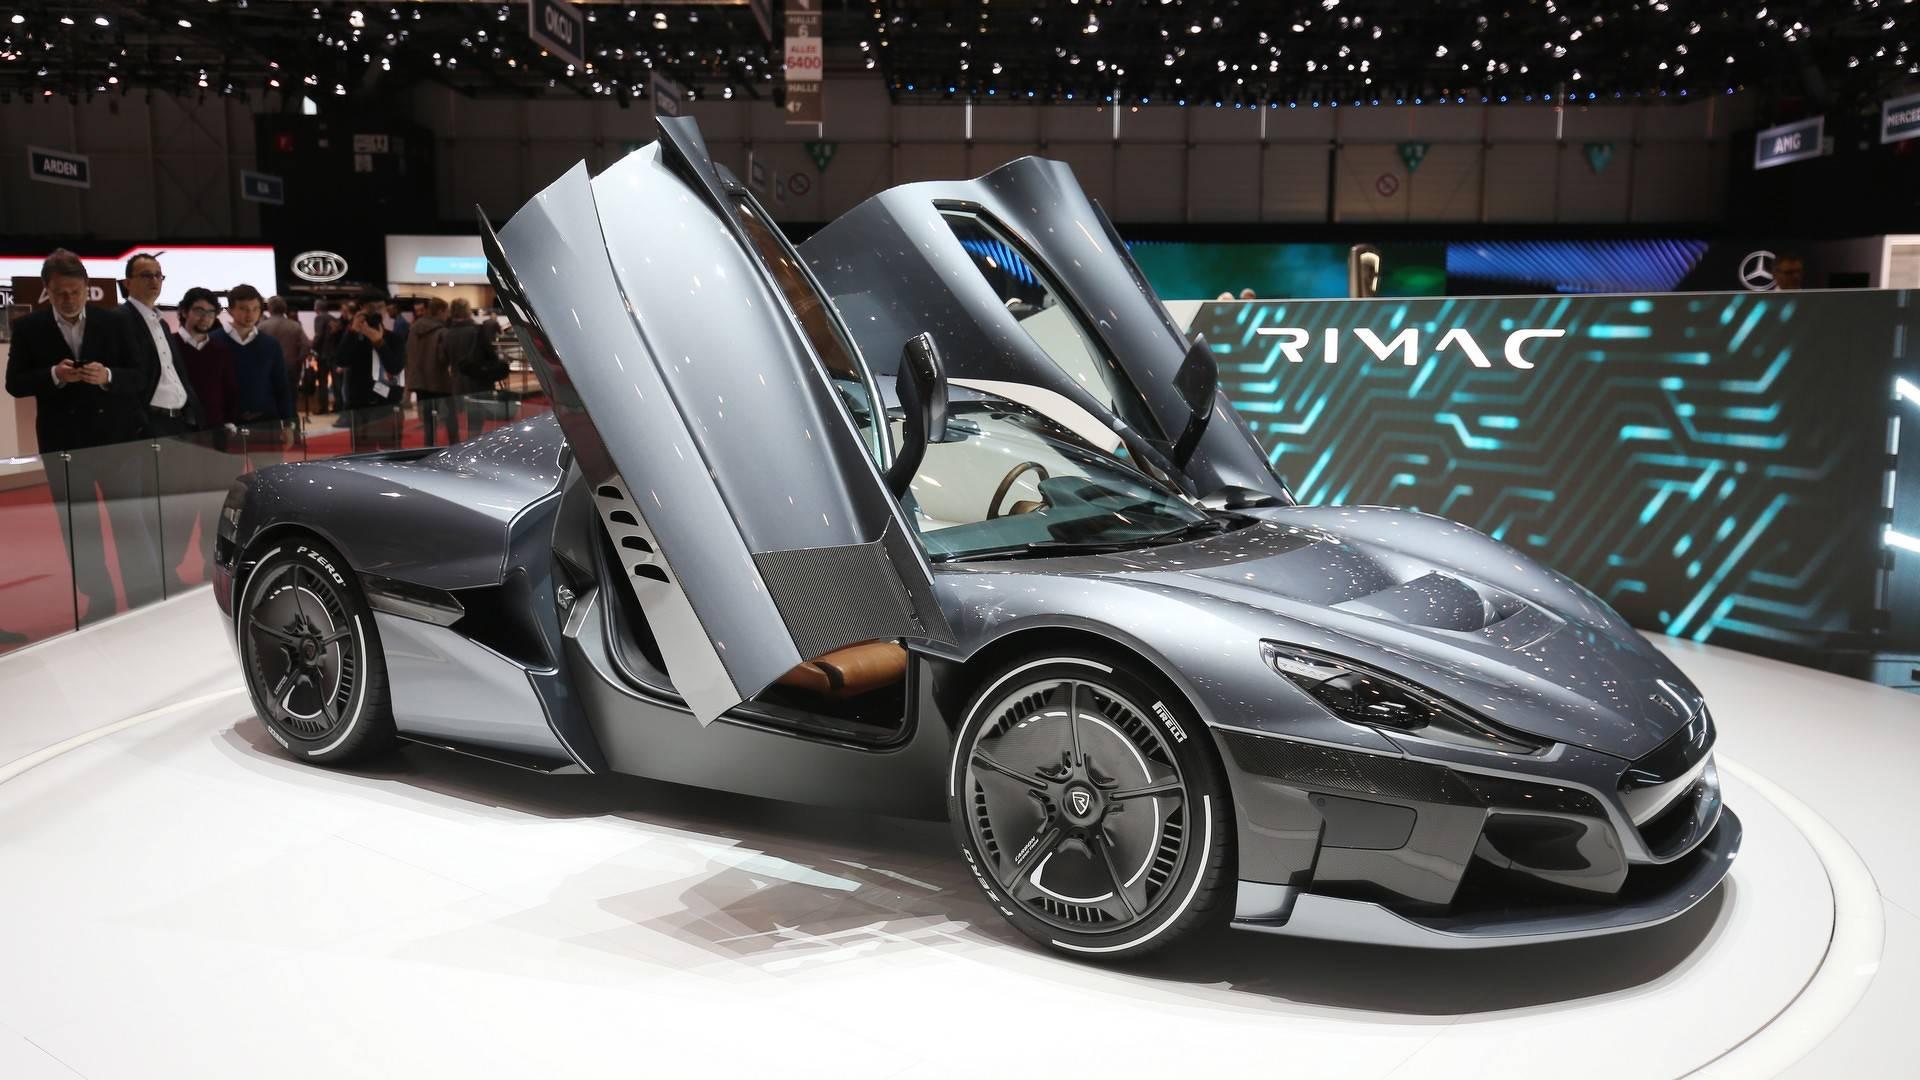 Dünyadaki en hızlı elektrikli otomobiller rimac concept 2 elektrikli otomobil https://huglero.com